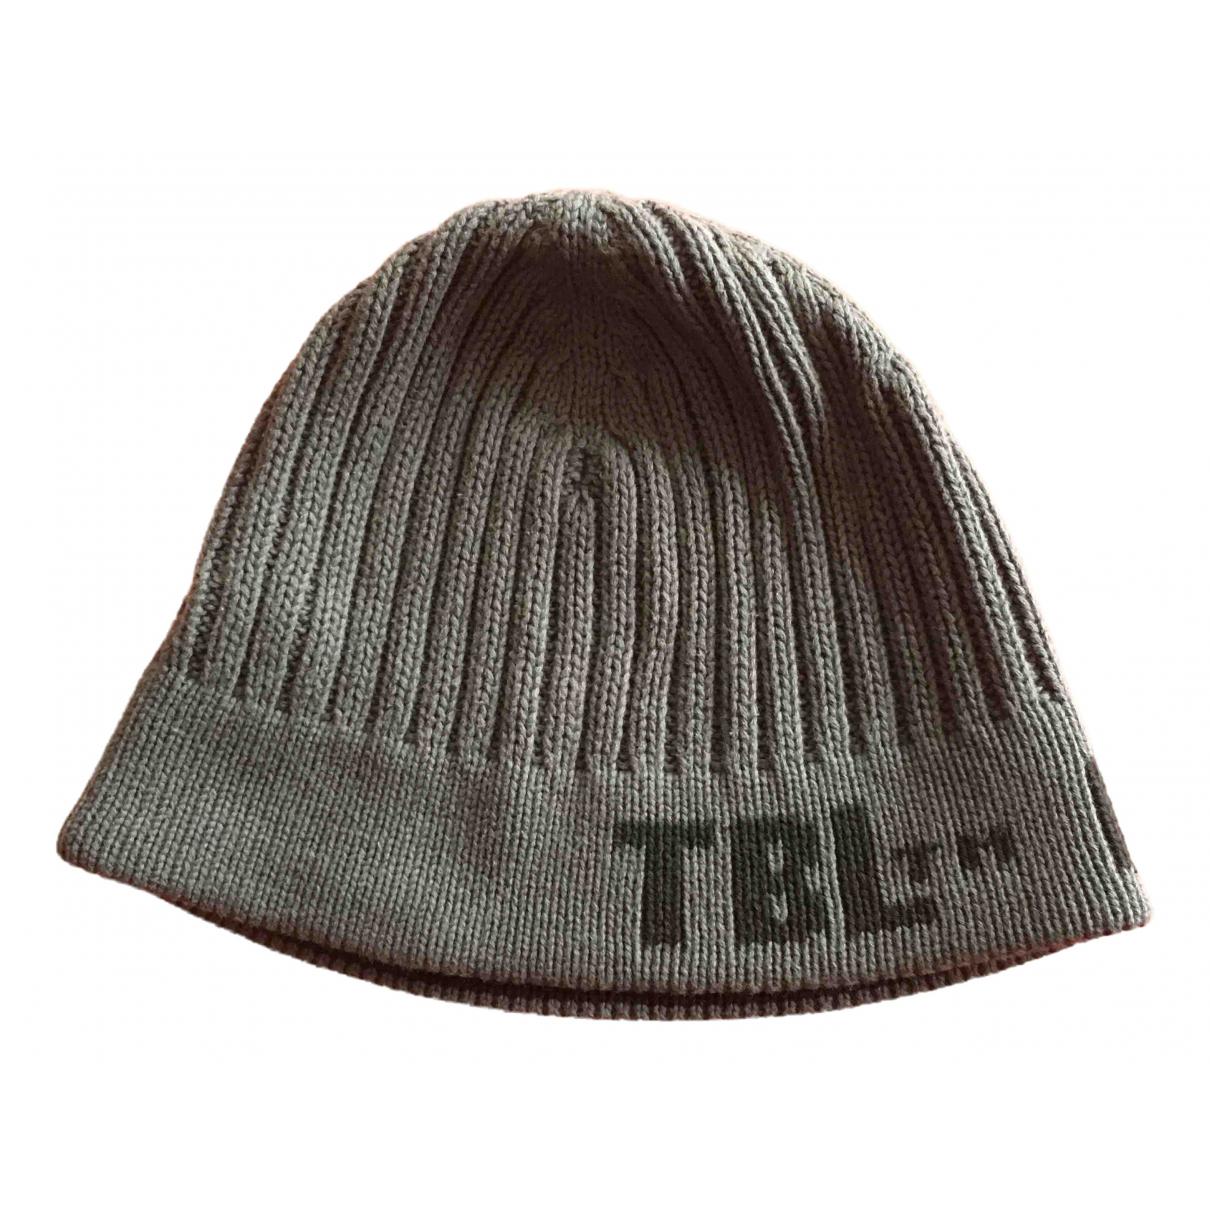 Timberland N Grey Wool hat & Gloves for Kids N